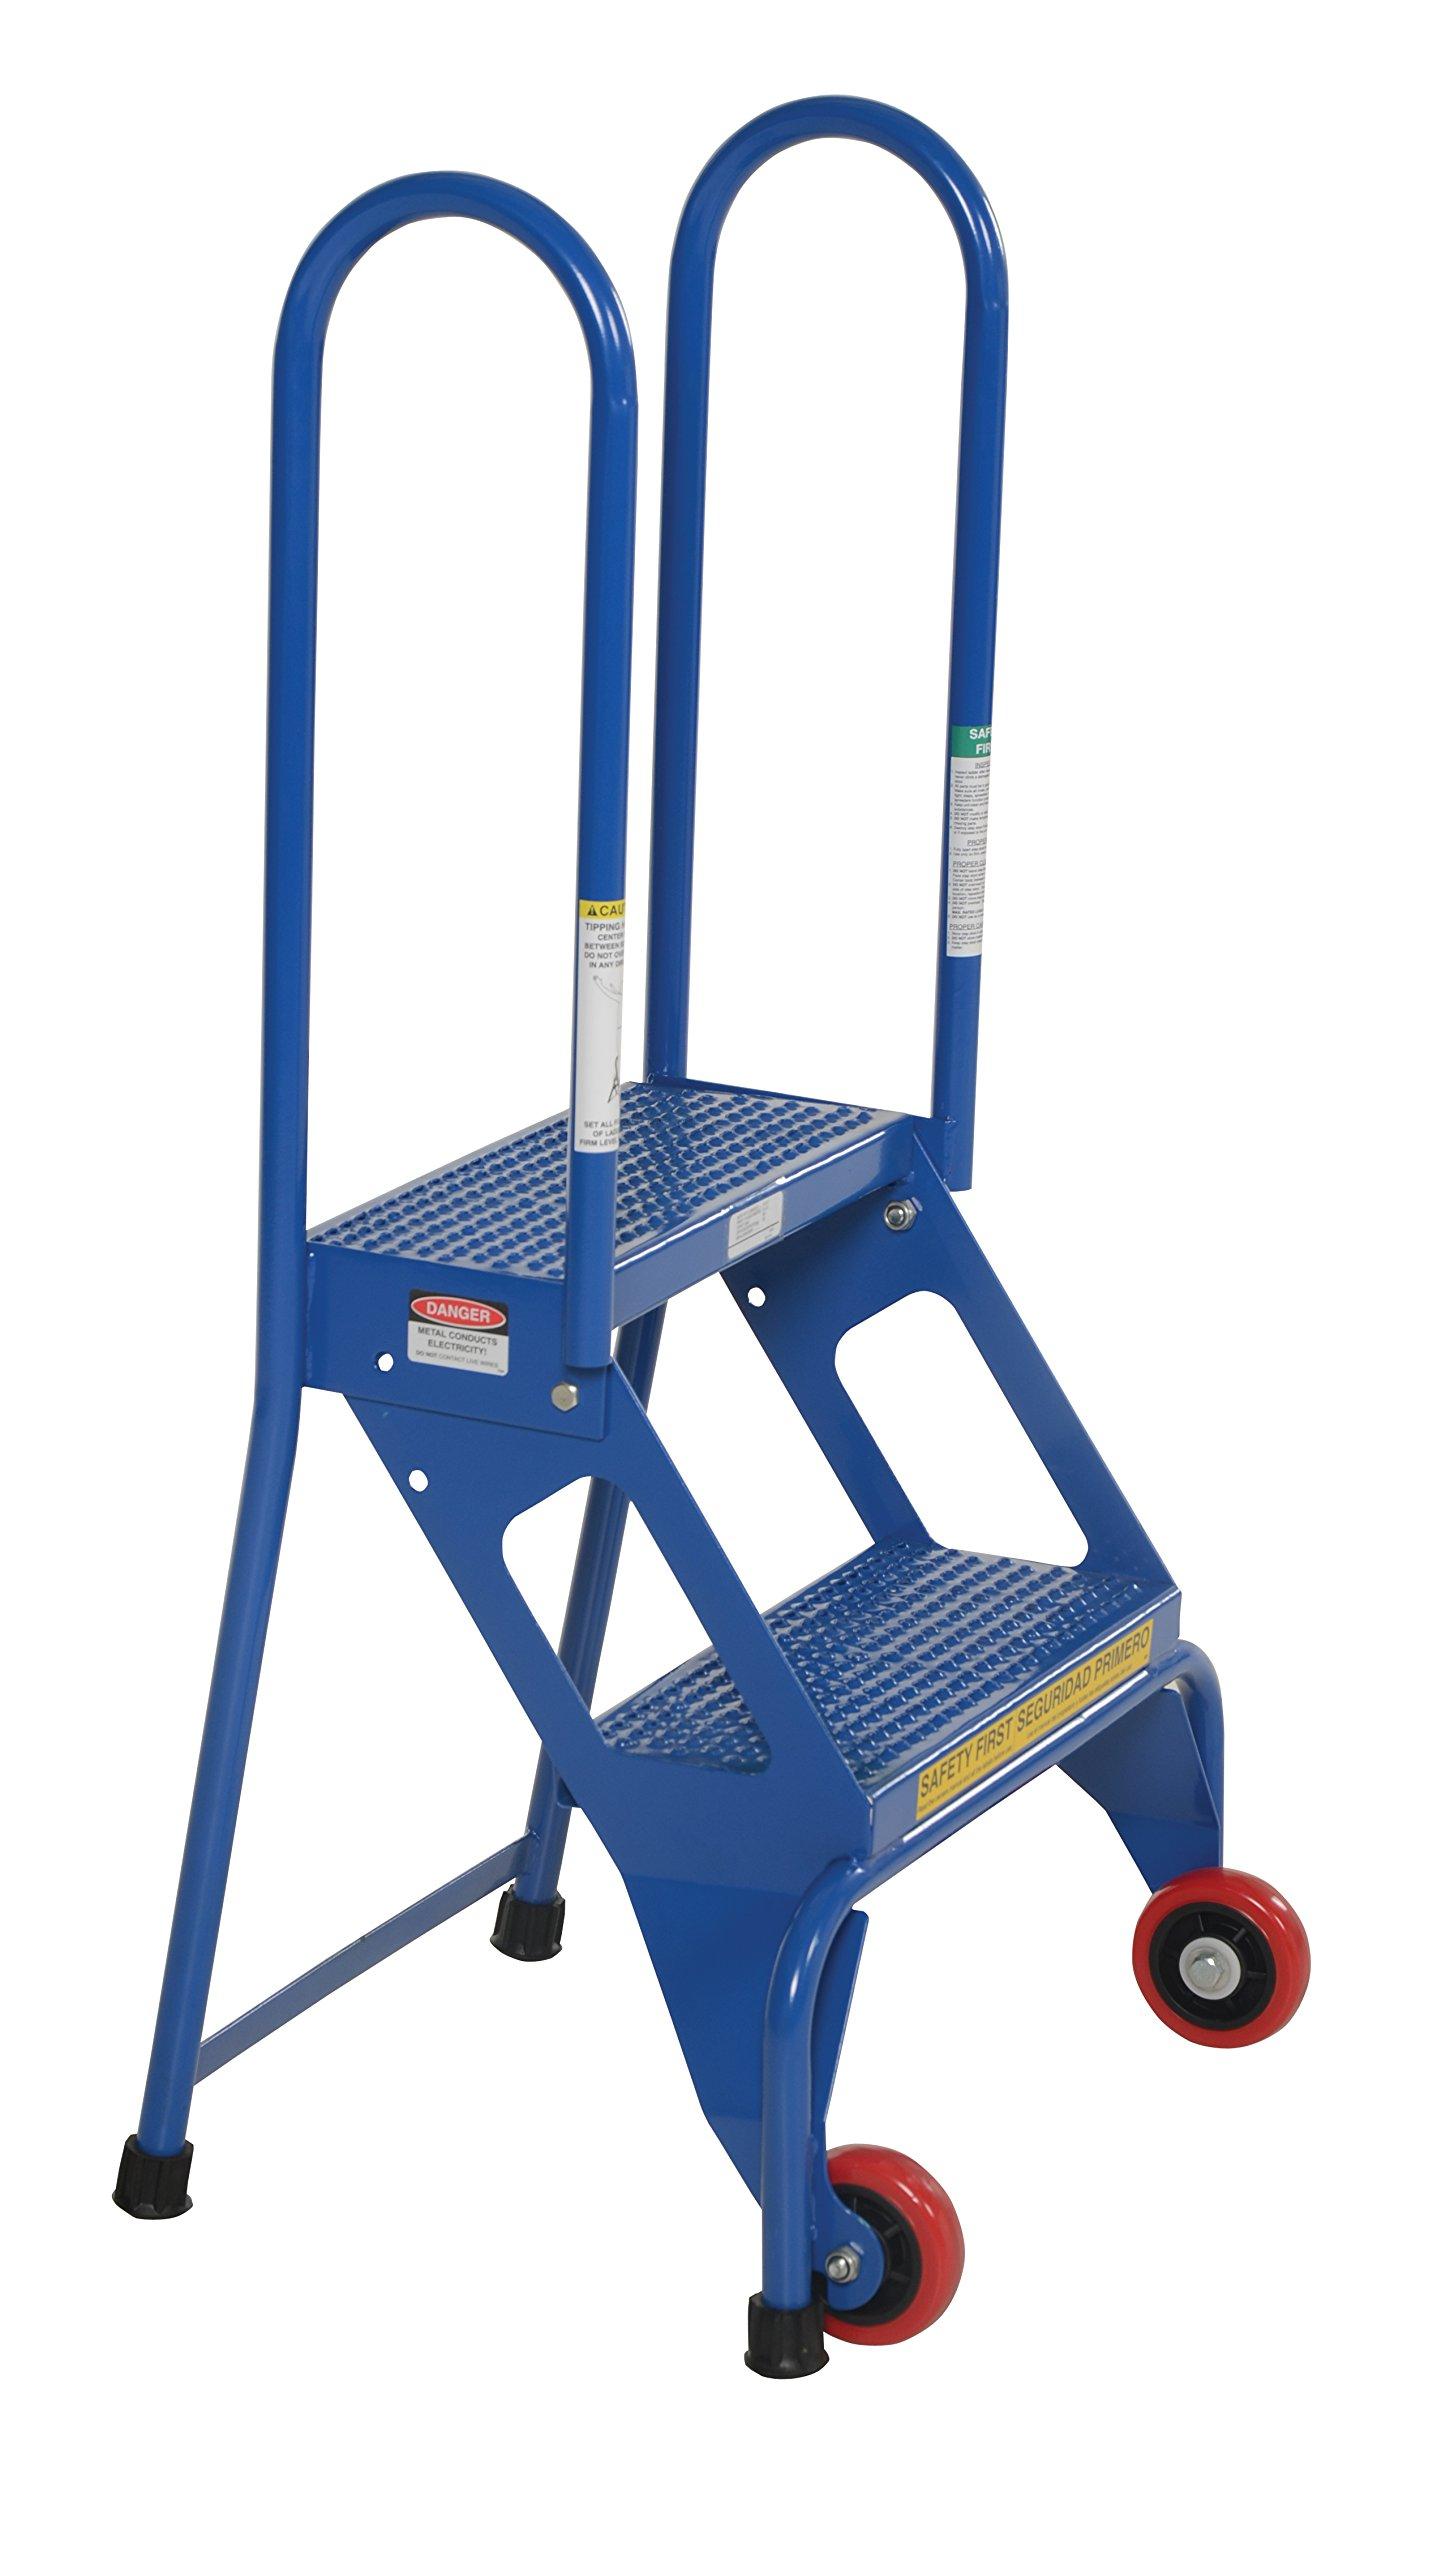 Vestil FLAD-2 Folding Ladder with Wheels, Carbon Steel, 2 Steps, 350 lbs Capacity, 20-5/8'' Top Step Height